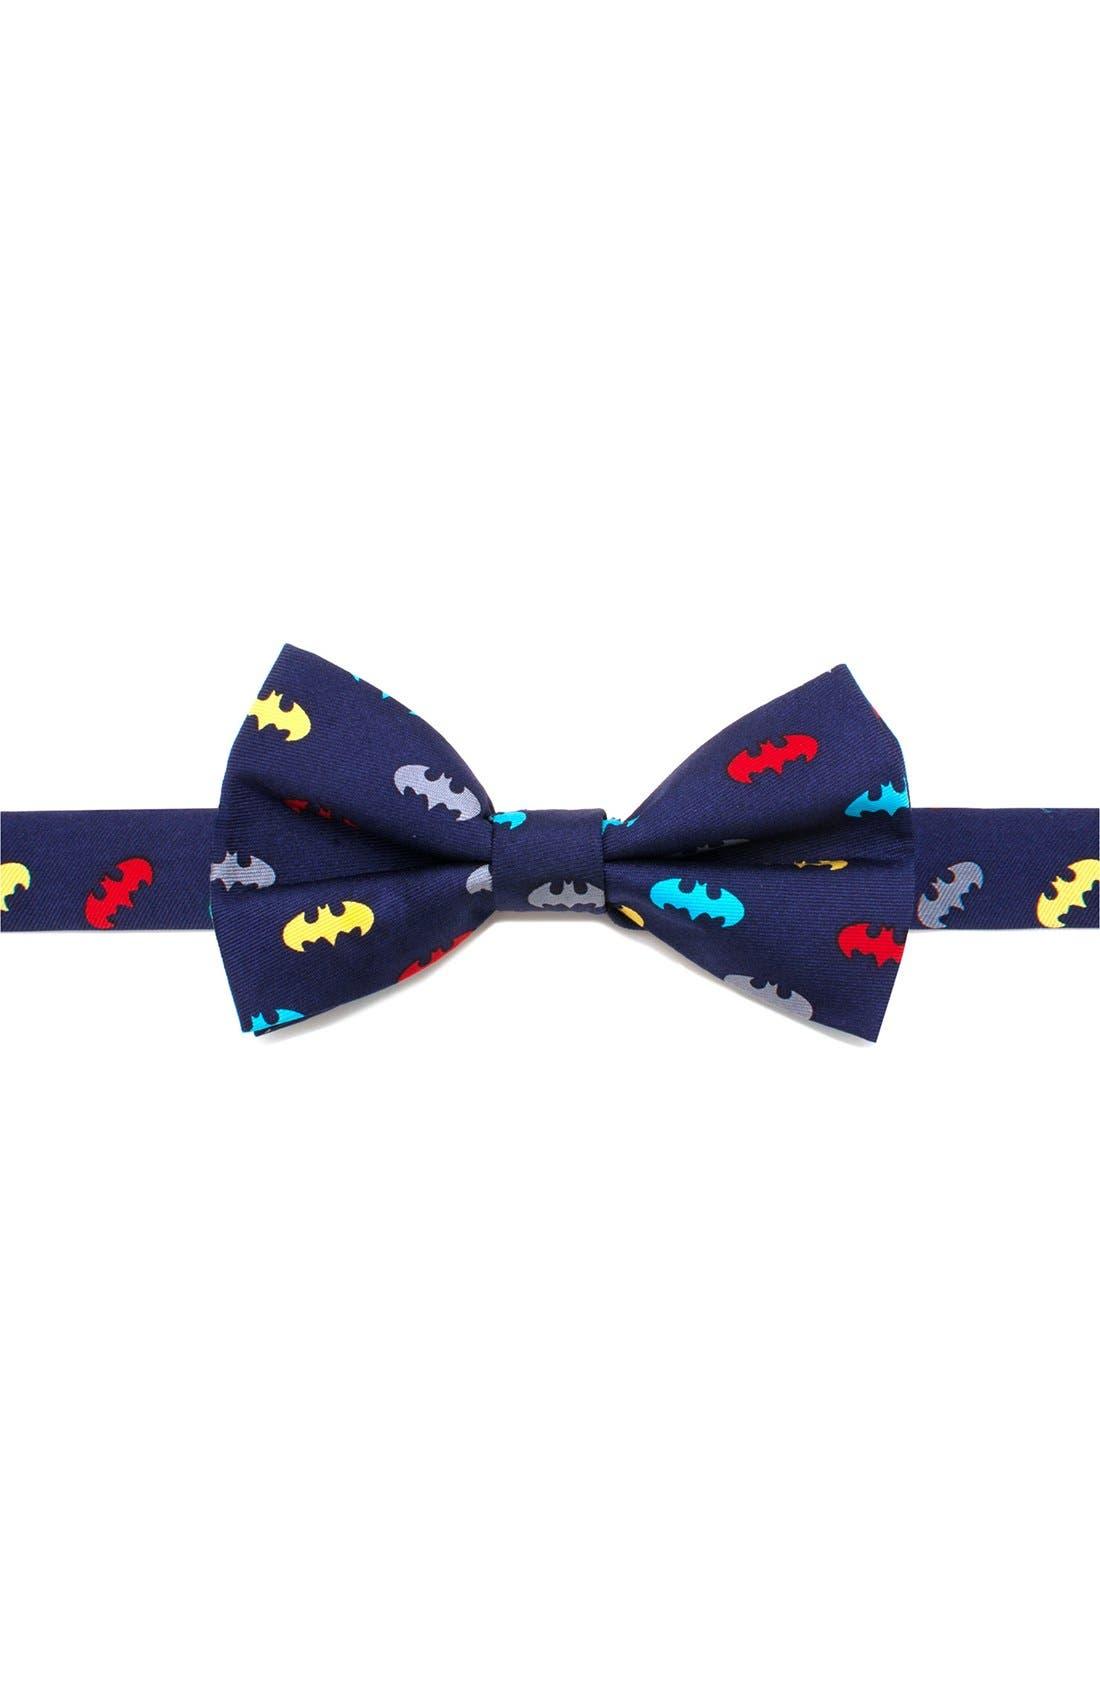 'Batman' Silk Bow Tie,                         Main,                         color, Multi